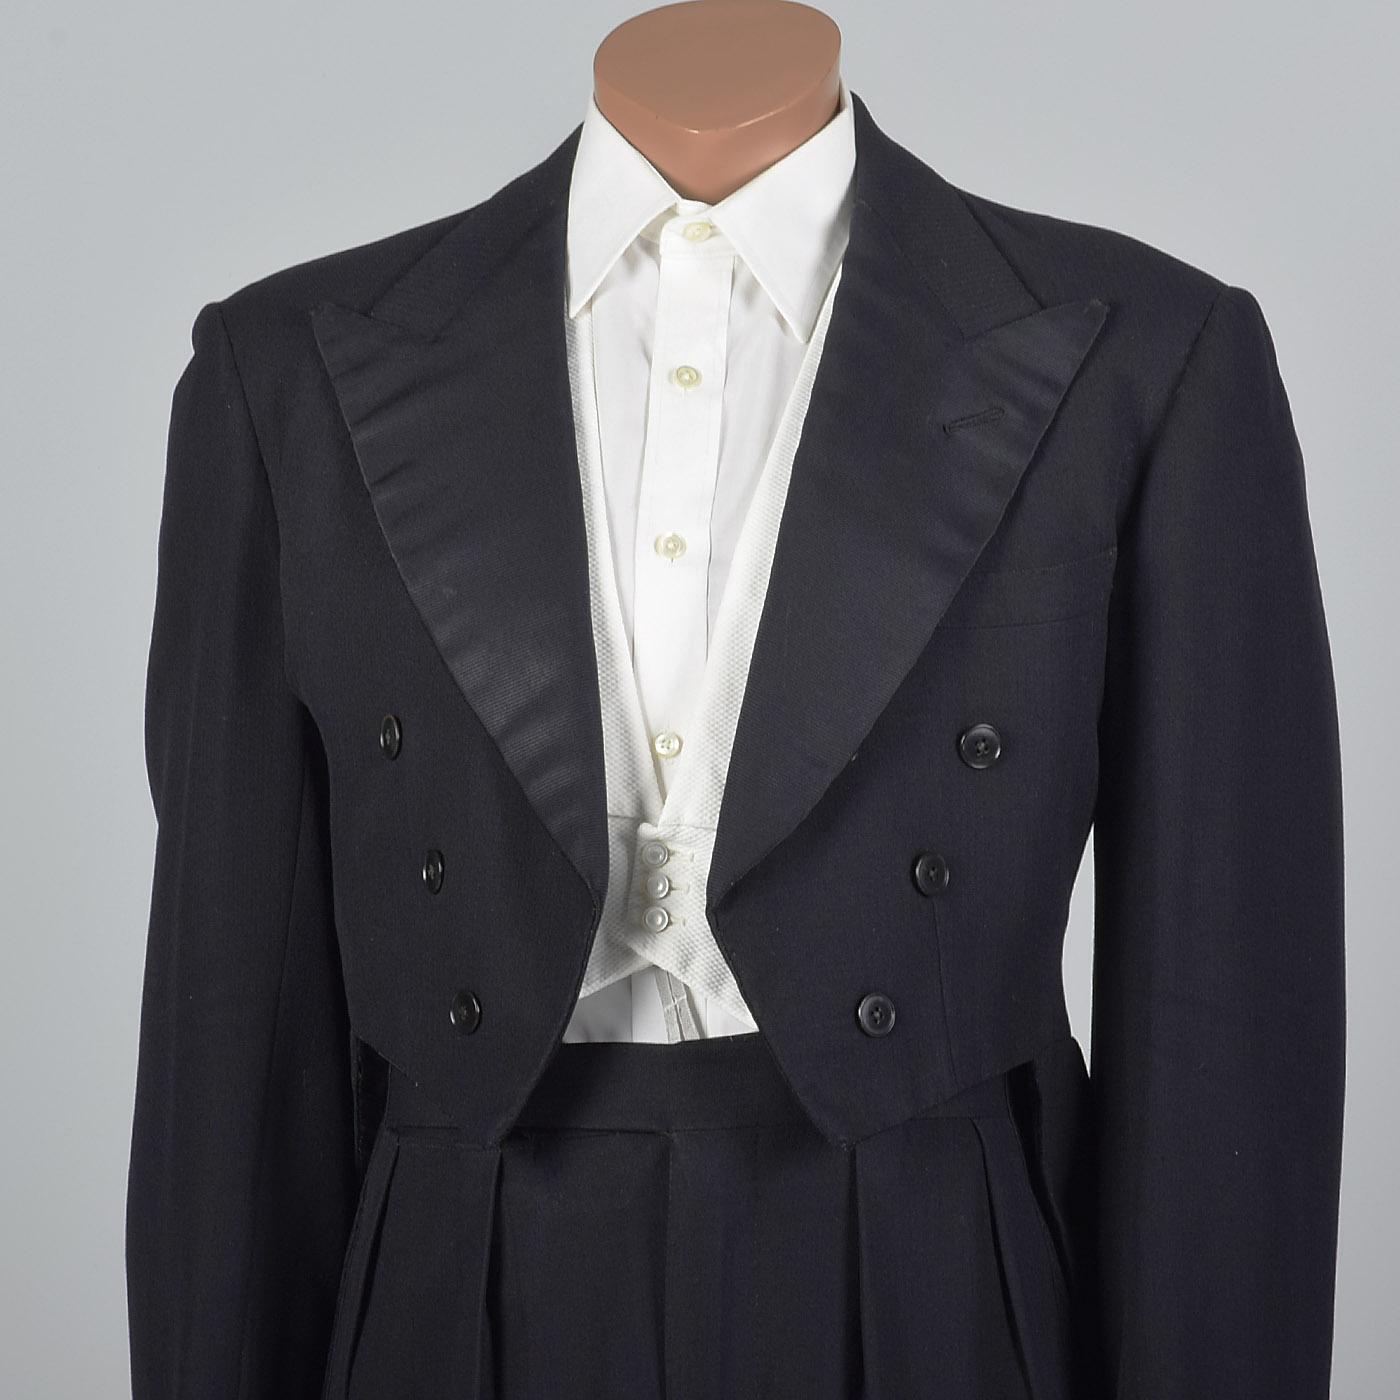 38 1950s Men Savile Row Tuxedo Black Tie White Tie Formal